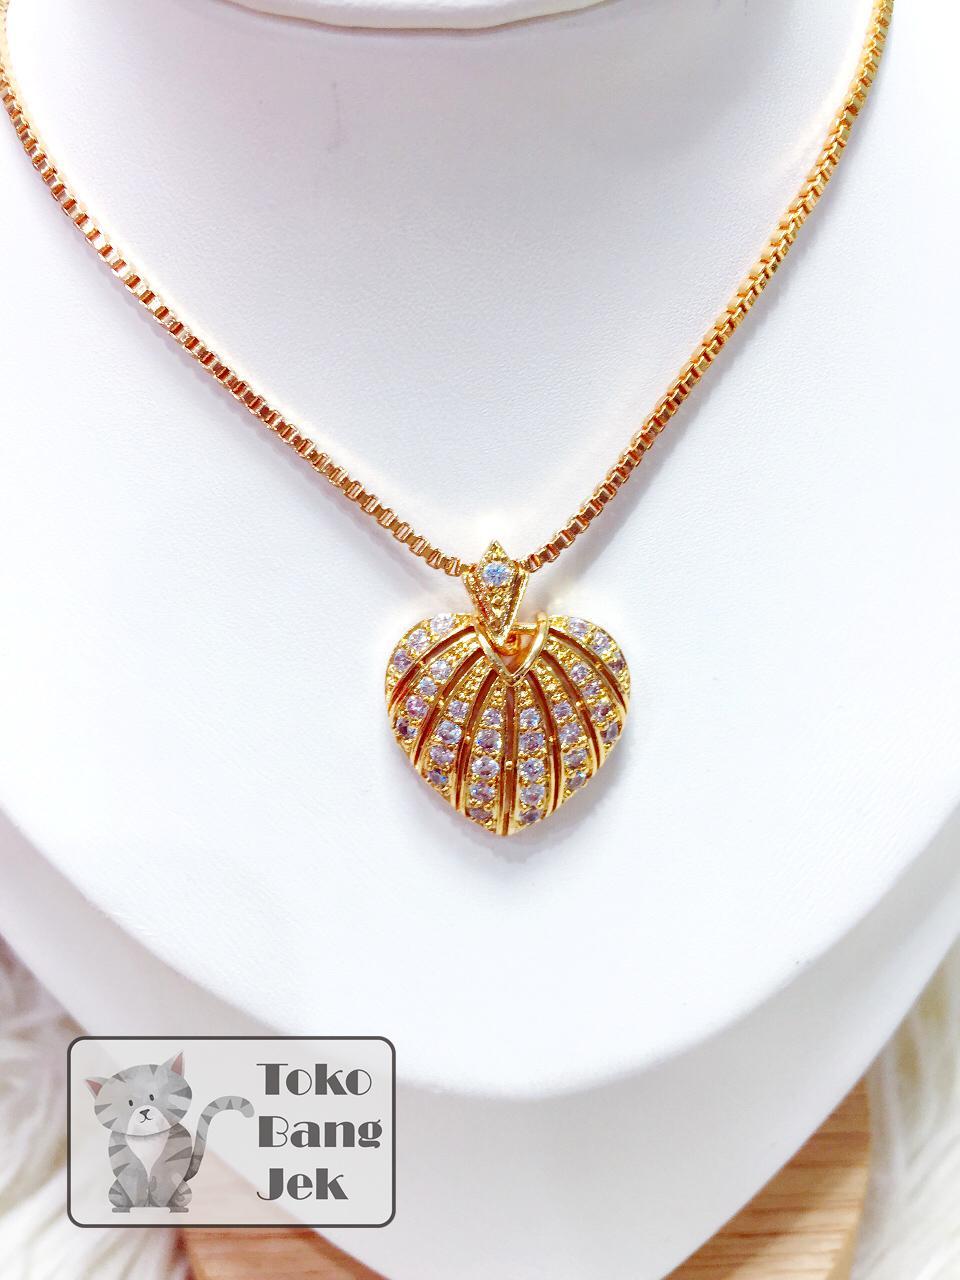 set kalung italy + liontin love xuping women womens jewelry aksesoris wanita